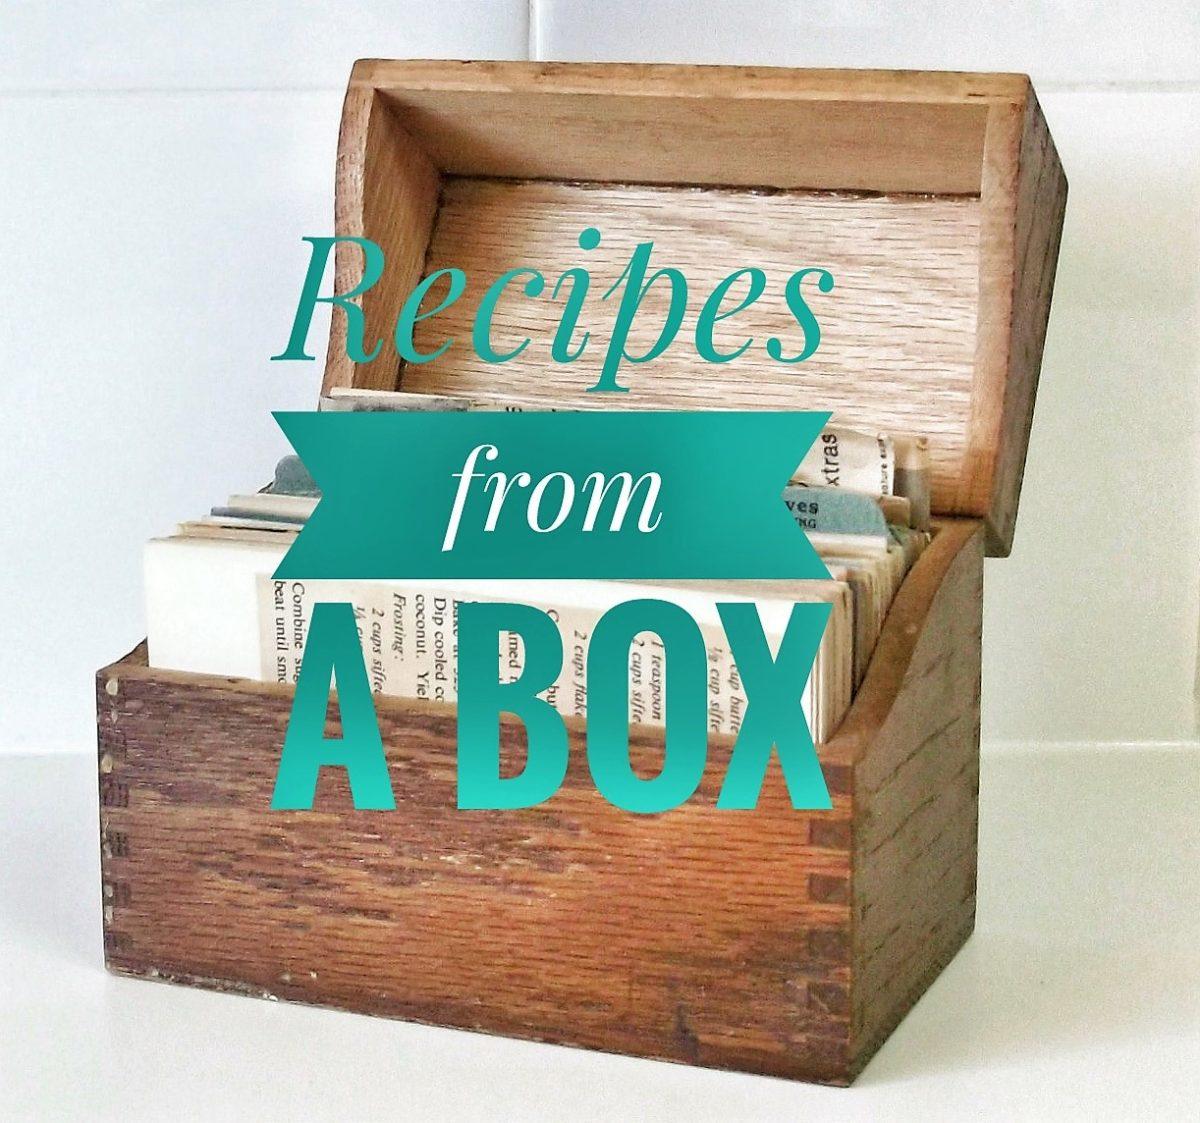 Recipe from a Box:  Cheesy Scalloped Potatoes